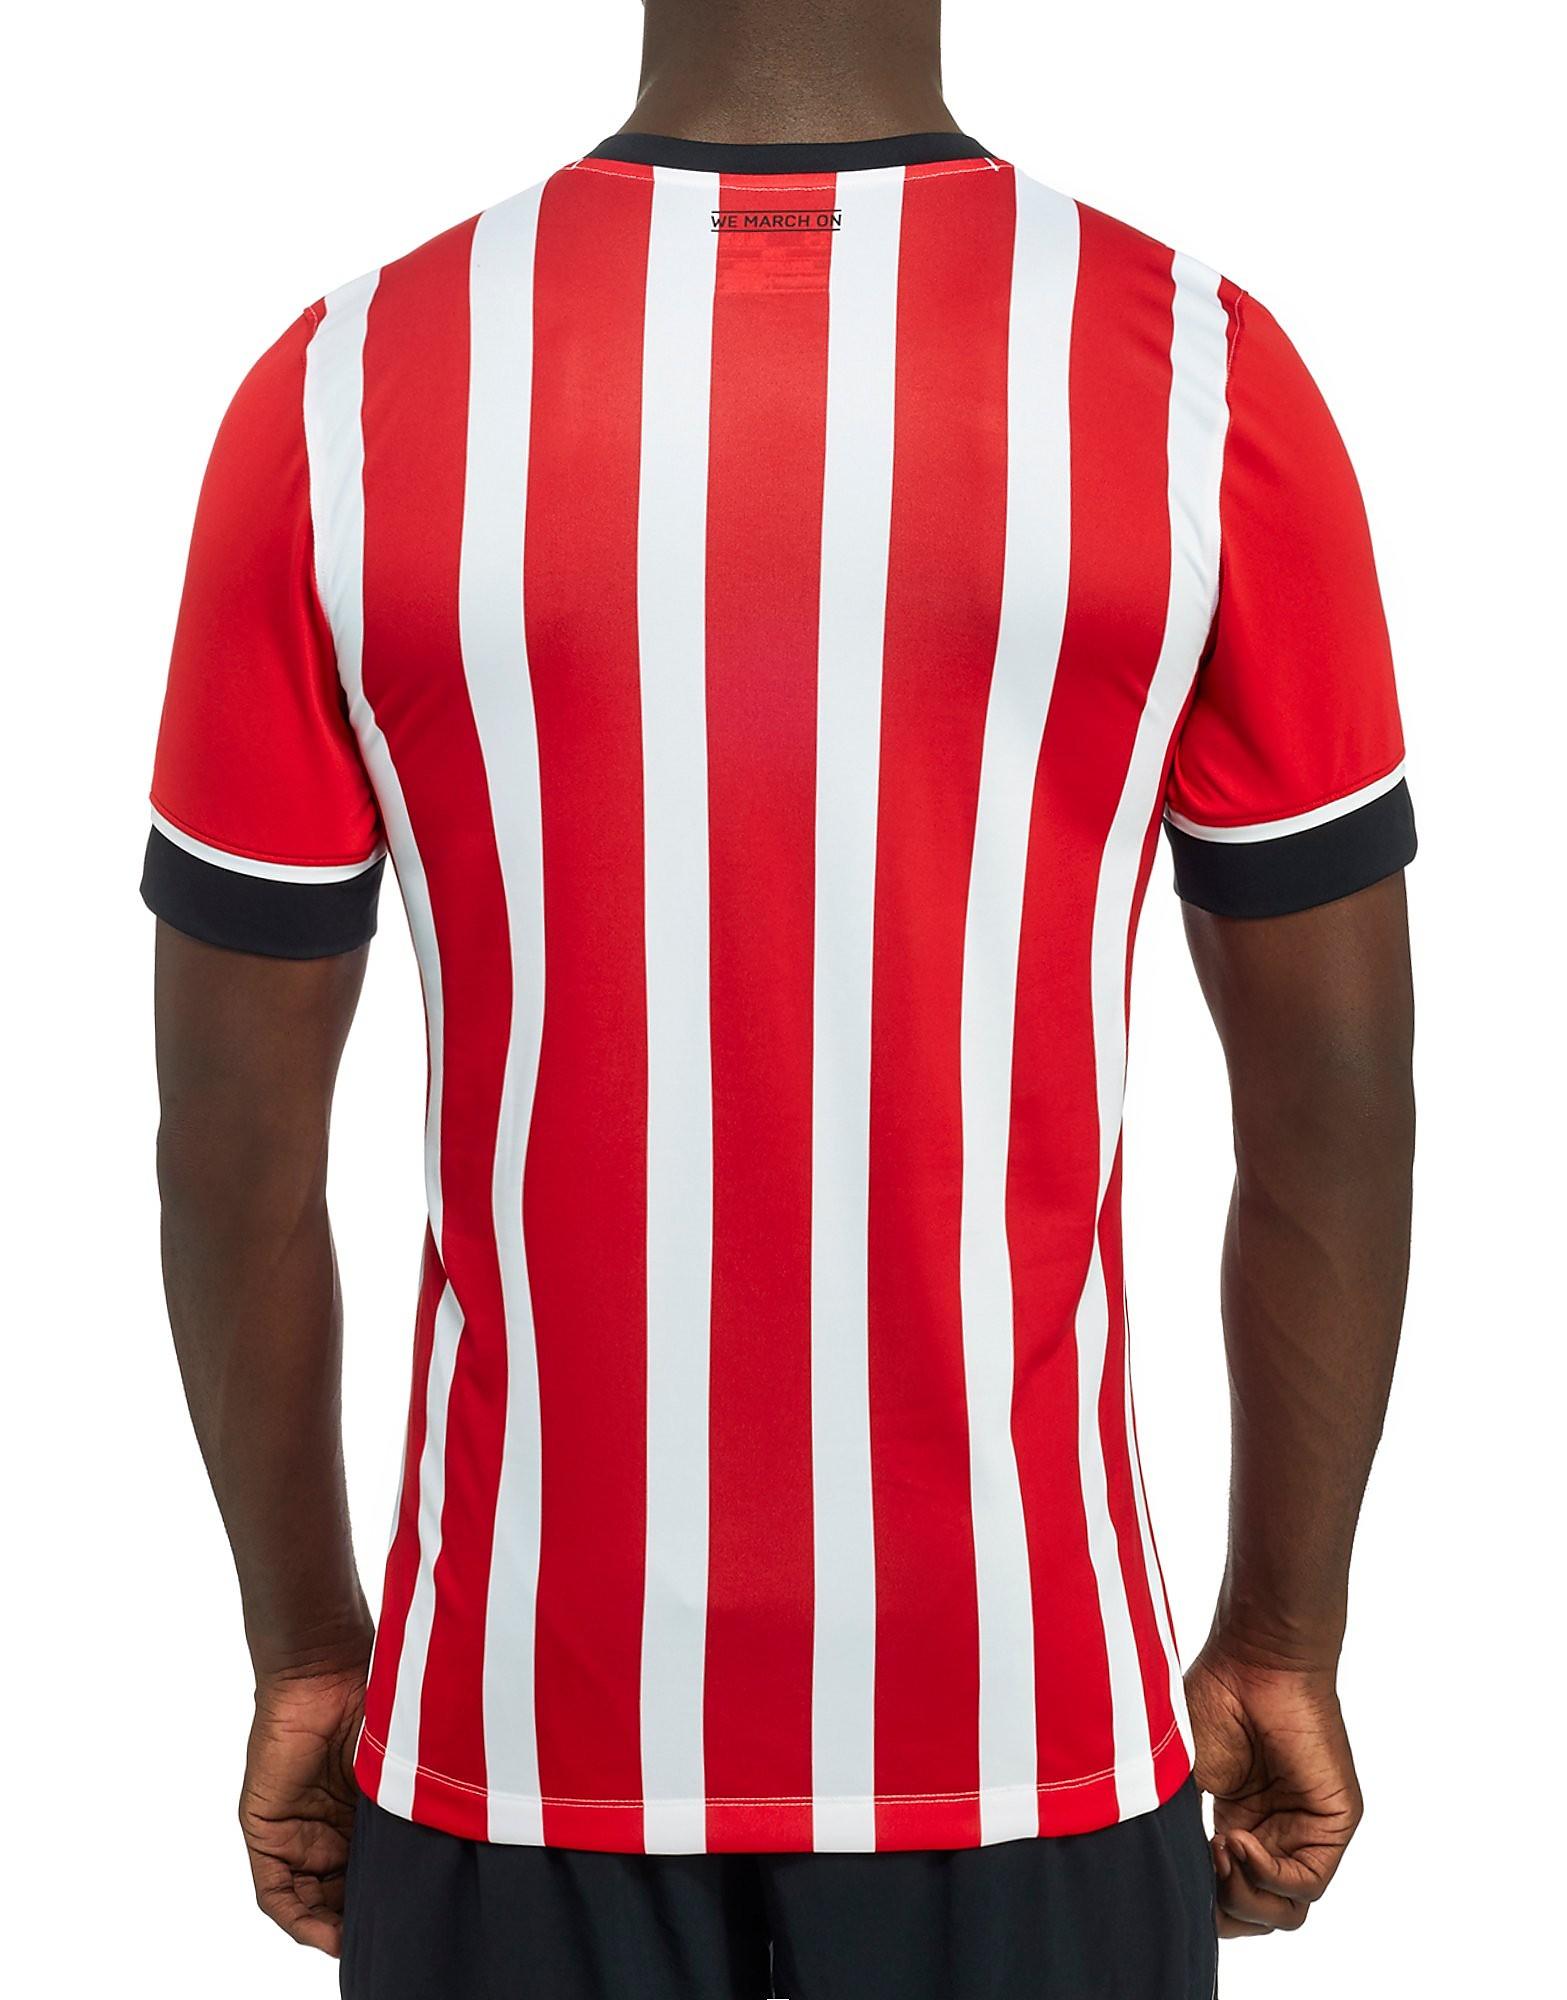 Under Armour Southampton FC 2016/17 Home Shirt